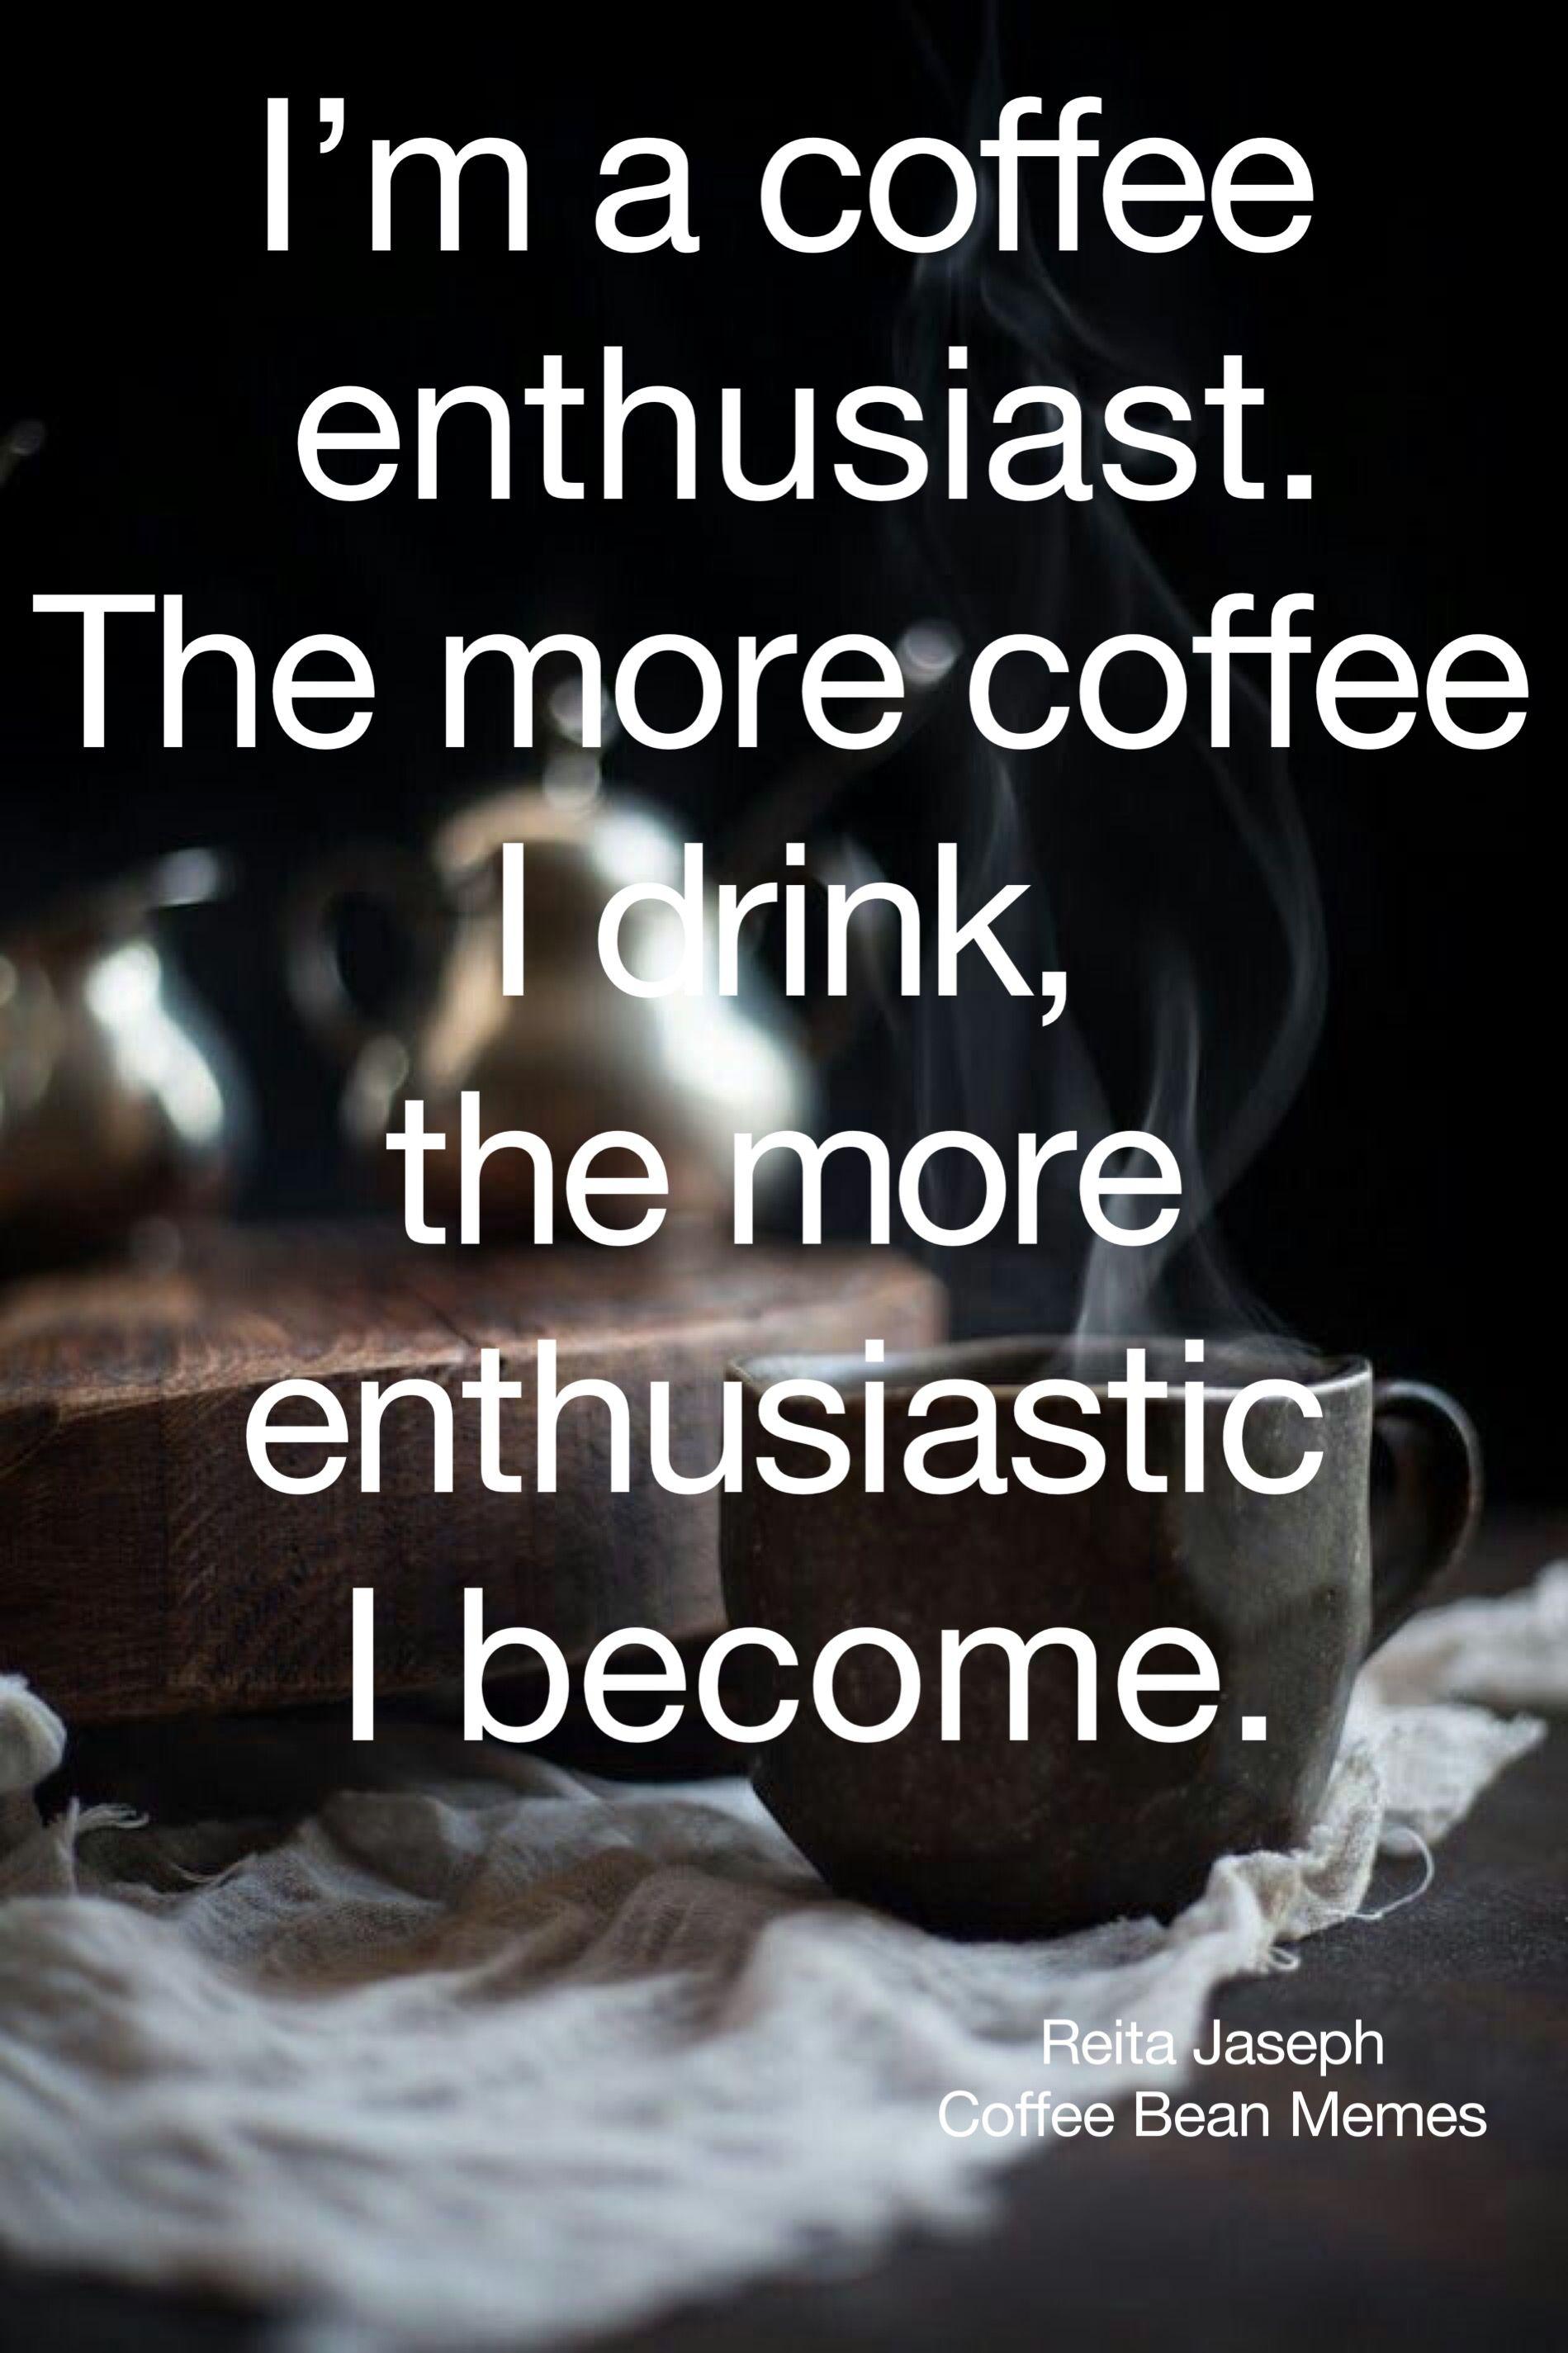 coffee #coffeequotes #coffeebeanmemes | Coffee Bean Memes ... #coffeeBean